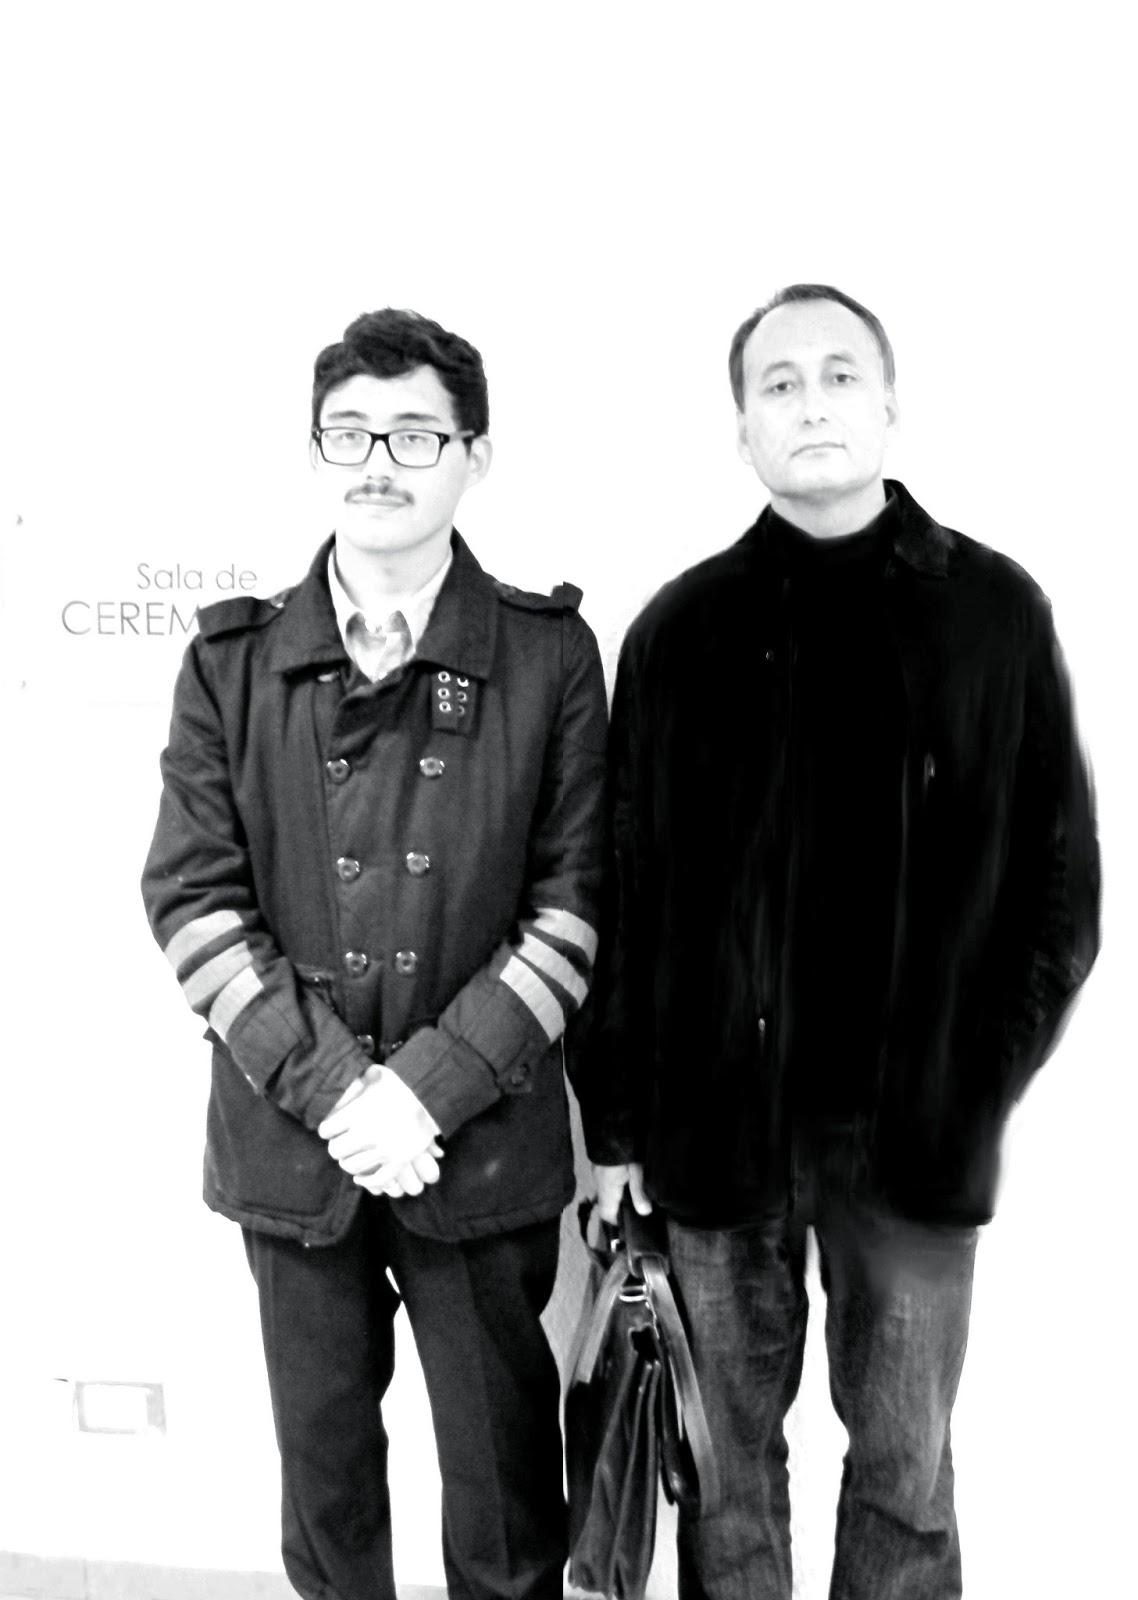 http://1.bp.blogspot.com/-bWK7B1R9w_c/USUrEVhz1ZI/AAAAAAAAG0U/kaOs6_nnKZU/s1600/Adolfo+Vasquez+Rocca+y+Andres+Registro+Civil_+2013++1+A++BN+70.jpeg